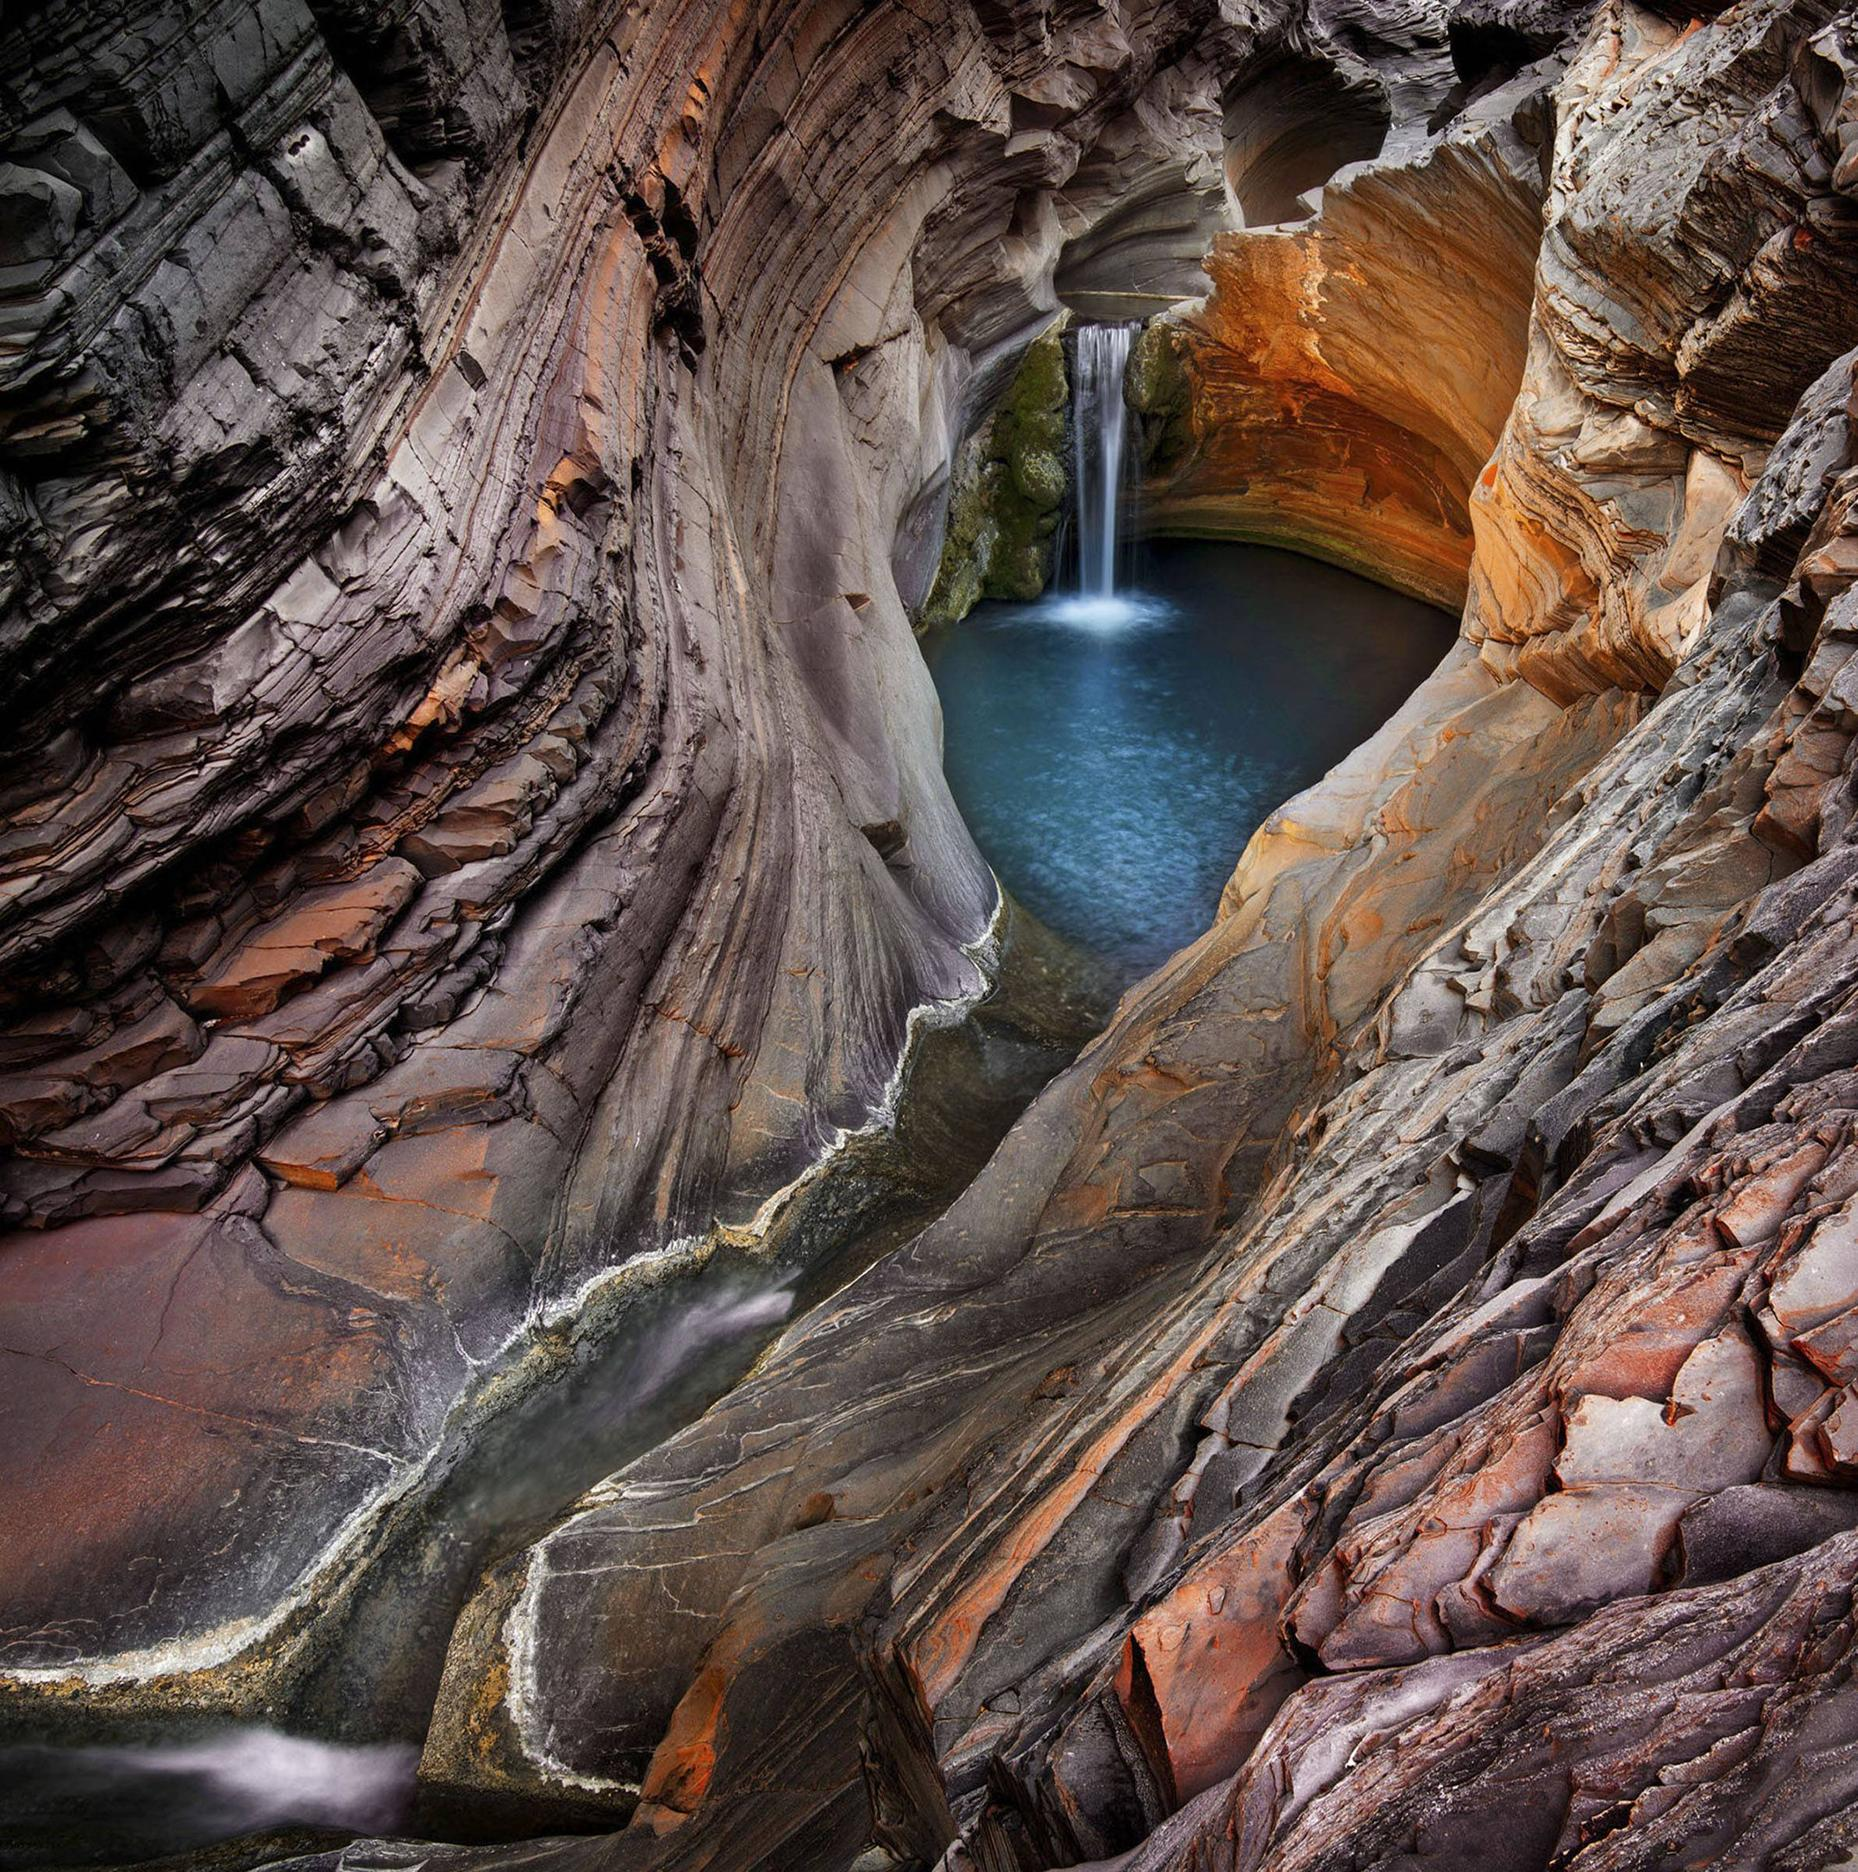 Caverns and Pools